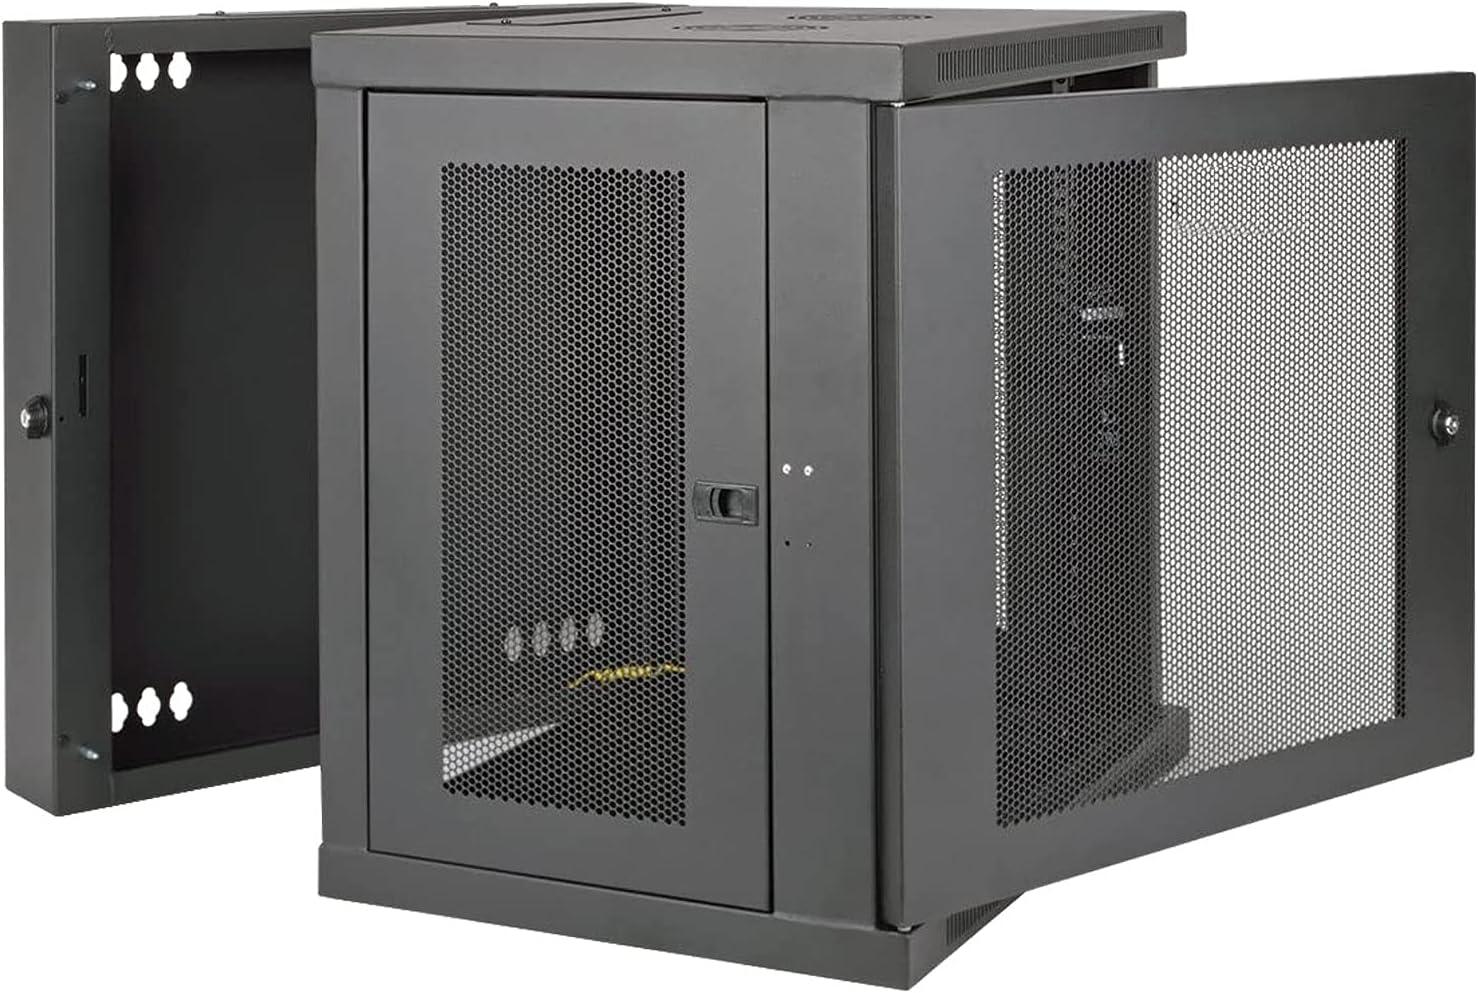 12U Wall Mount Rack Enclosure Server,Black,Hinged,ApplytoNetworkWiringRoom,ComputerRoom,DataRoom,ControlCenter,Home,Office,etc.SoldbyFerruNet